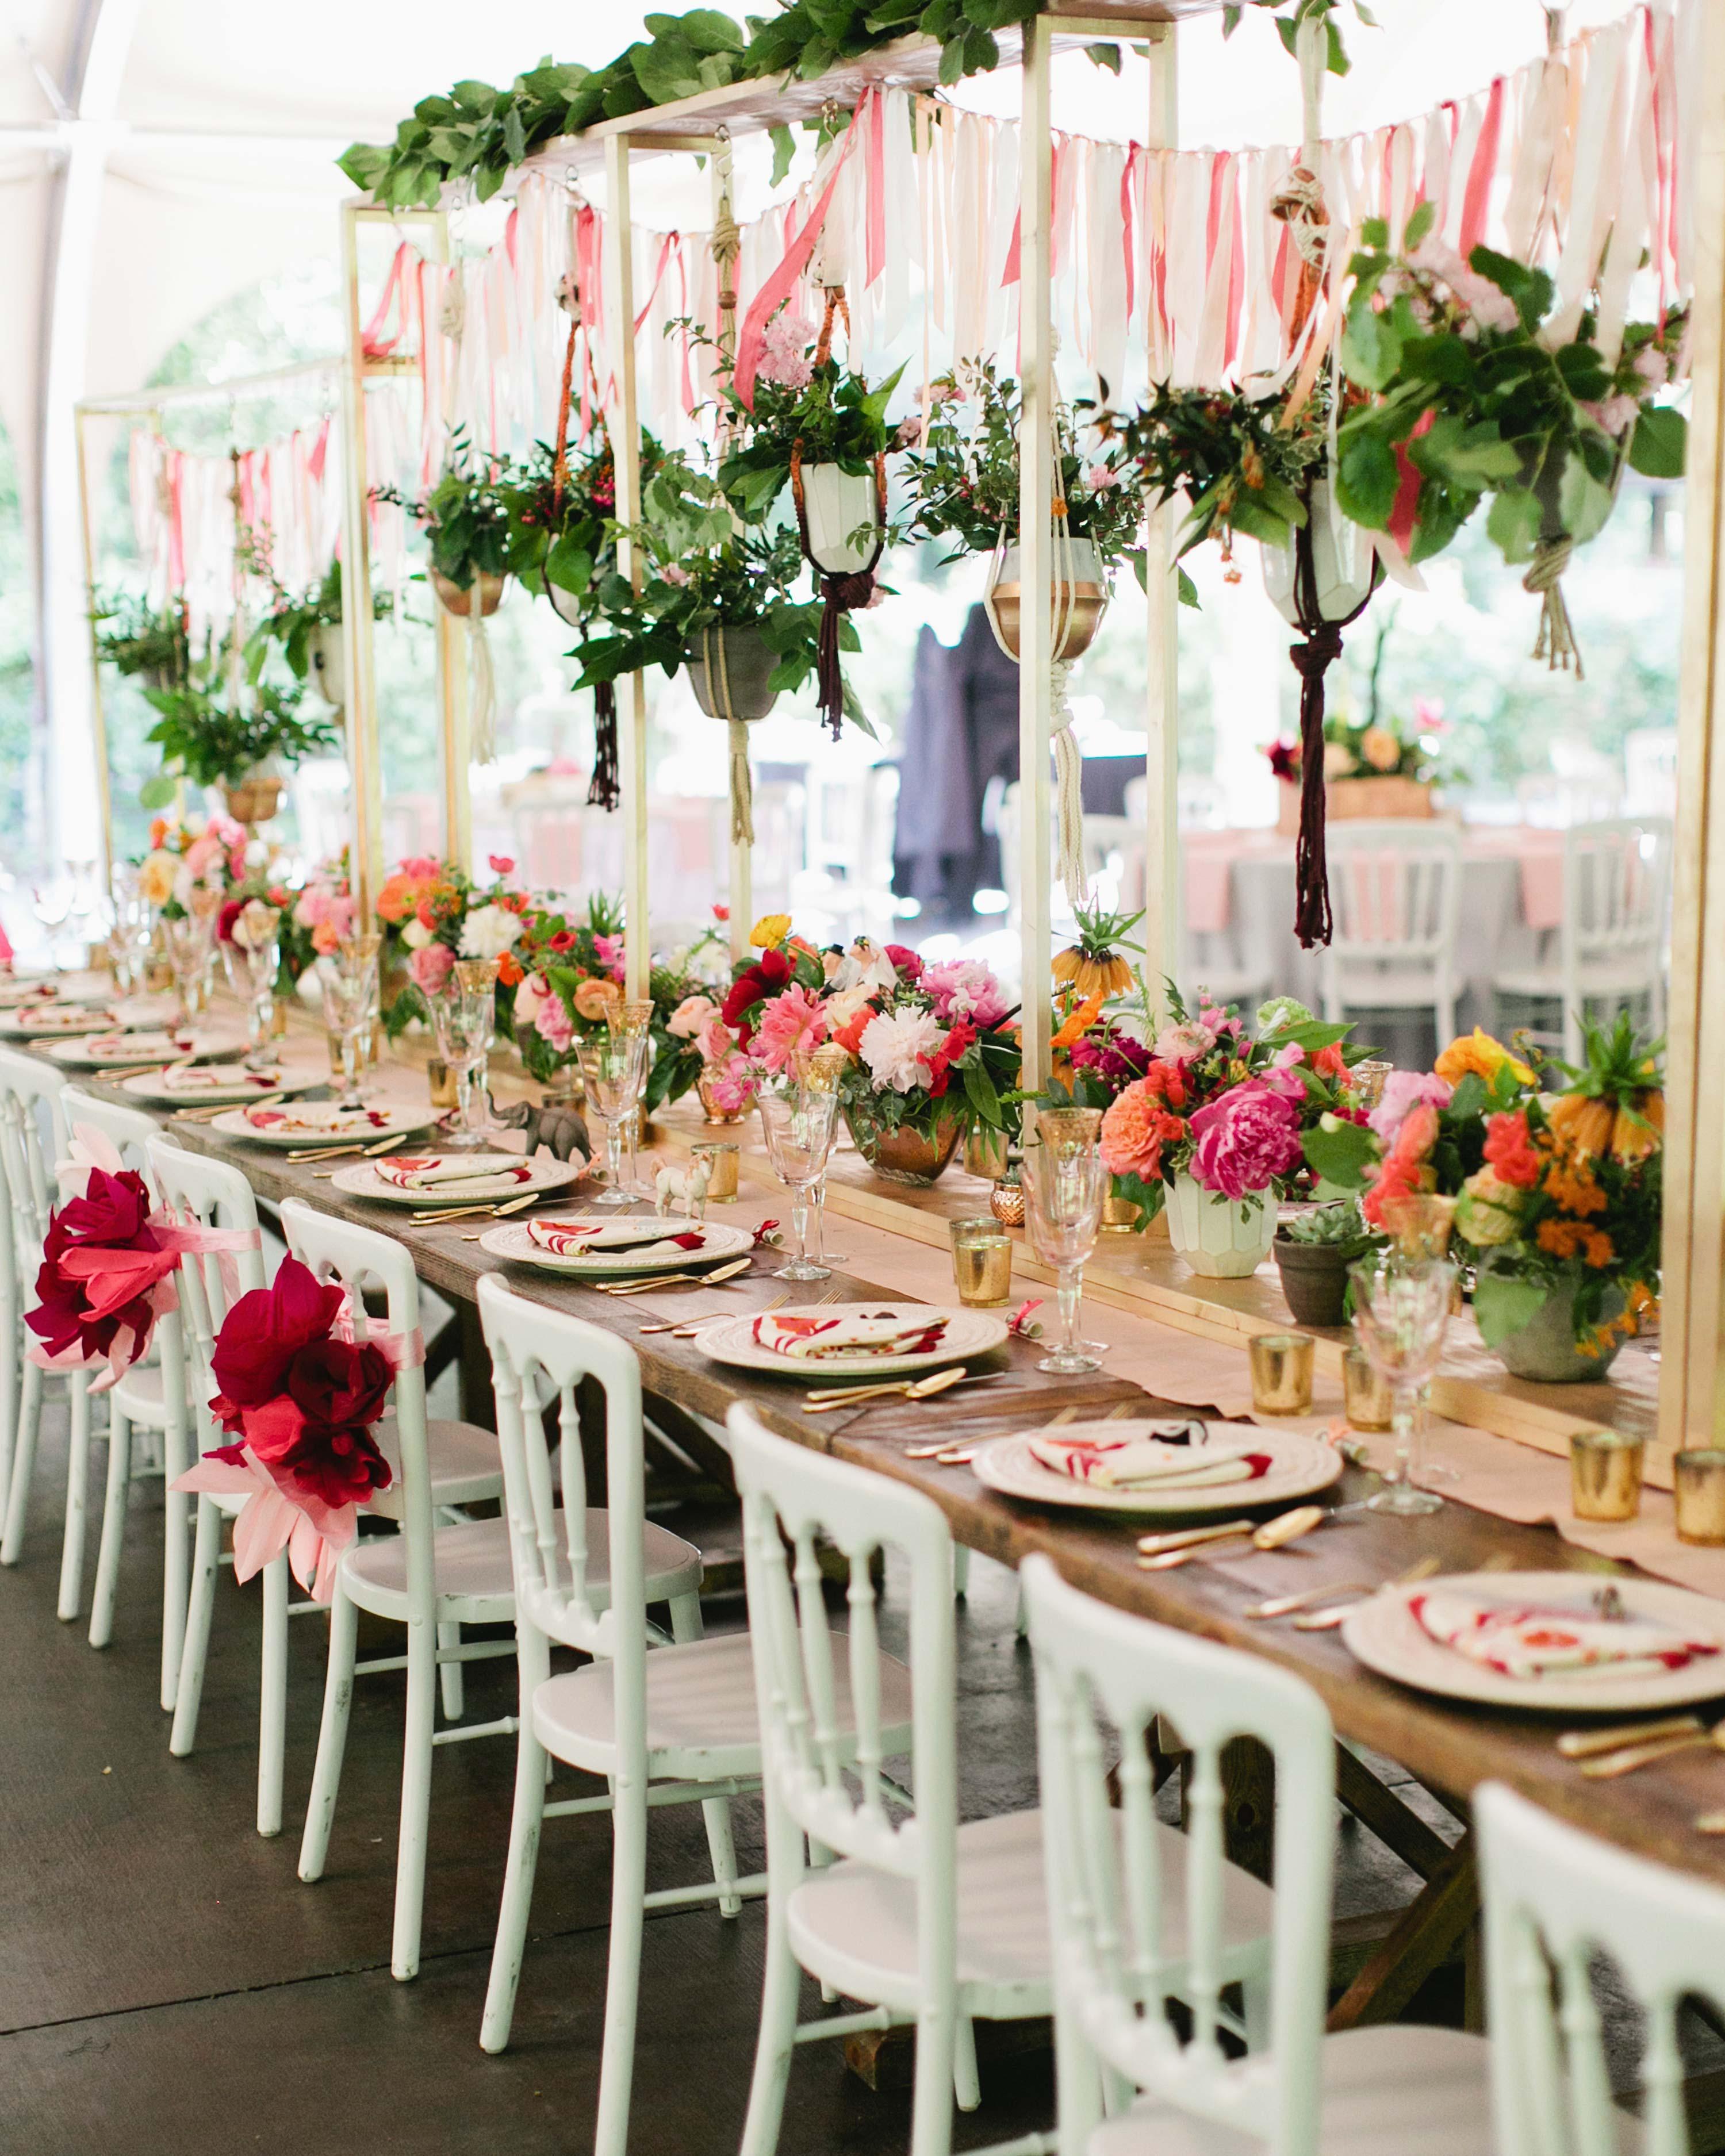 holly-john-wedding-texas-reception-072-s112833-0516.jpg